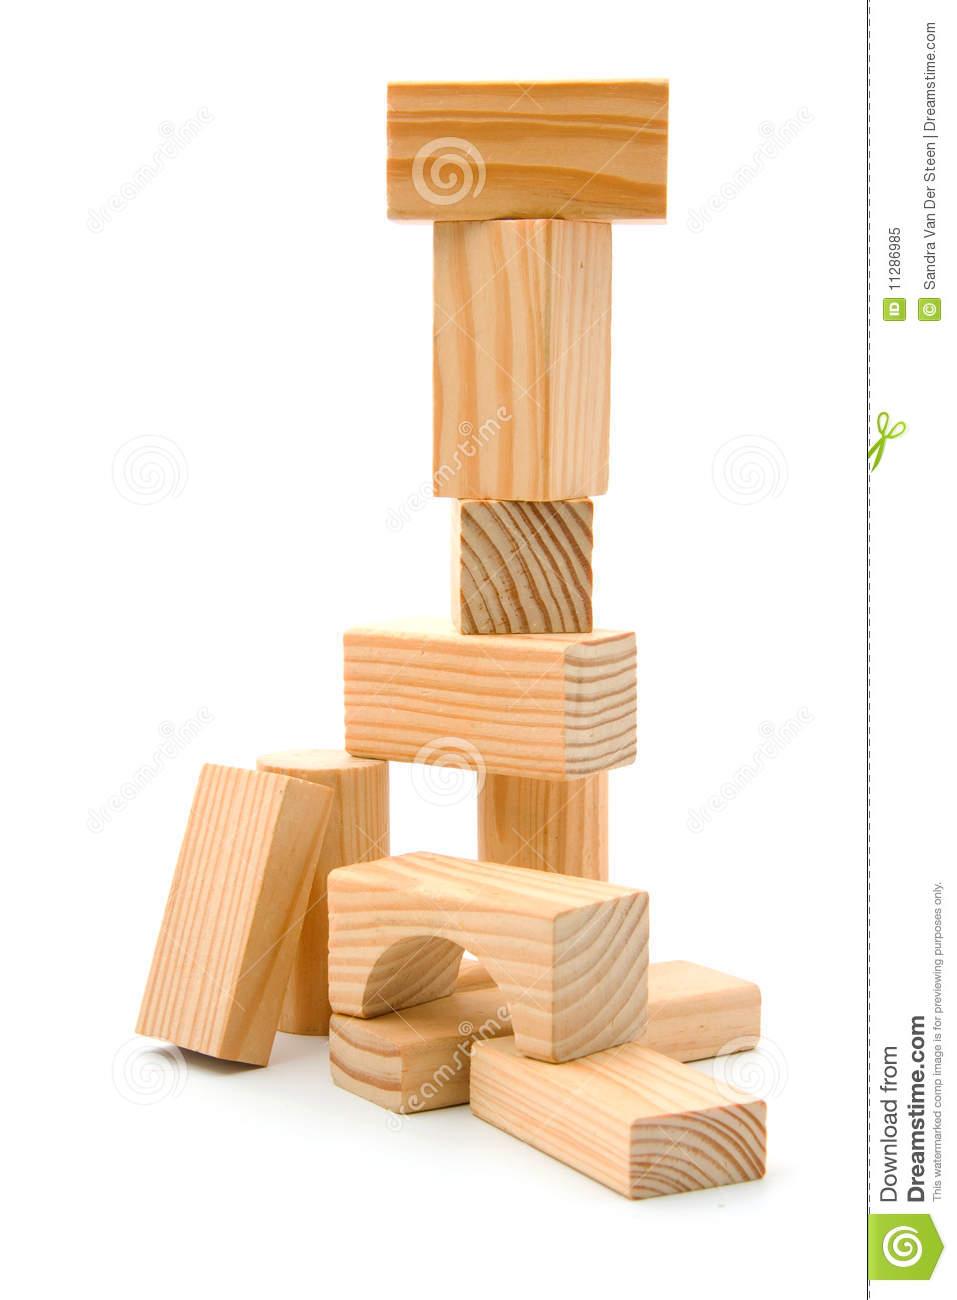 Wooden building blocks clipart transparent download Wooden building blocks clipart - ClipartFest transparent download